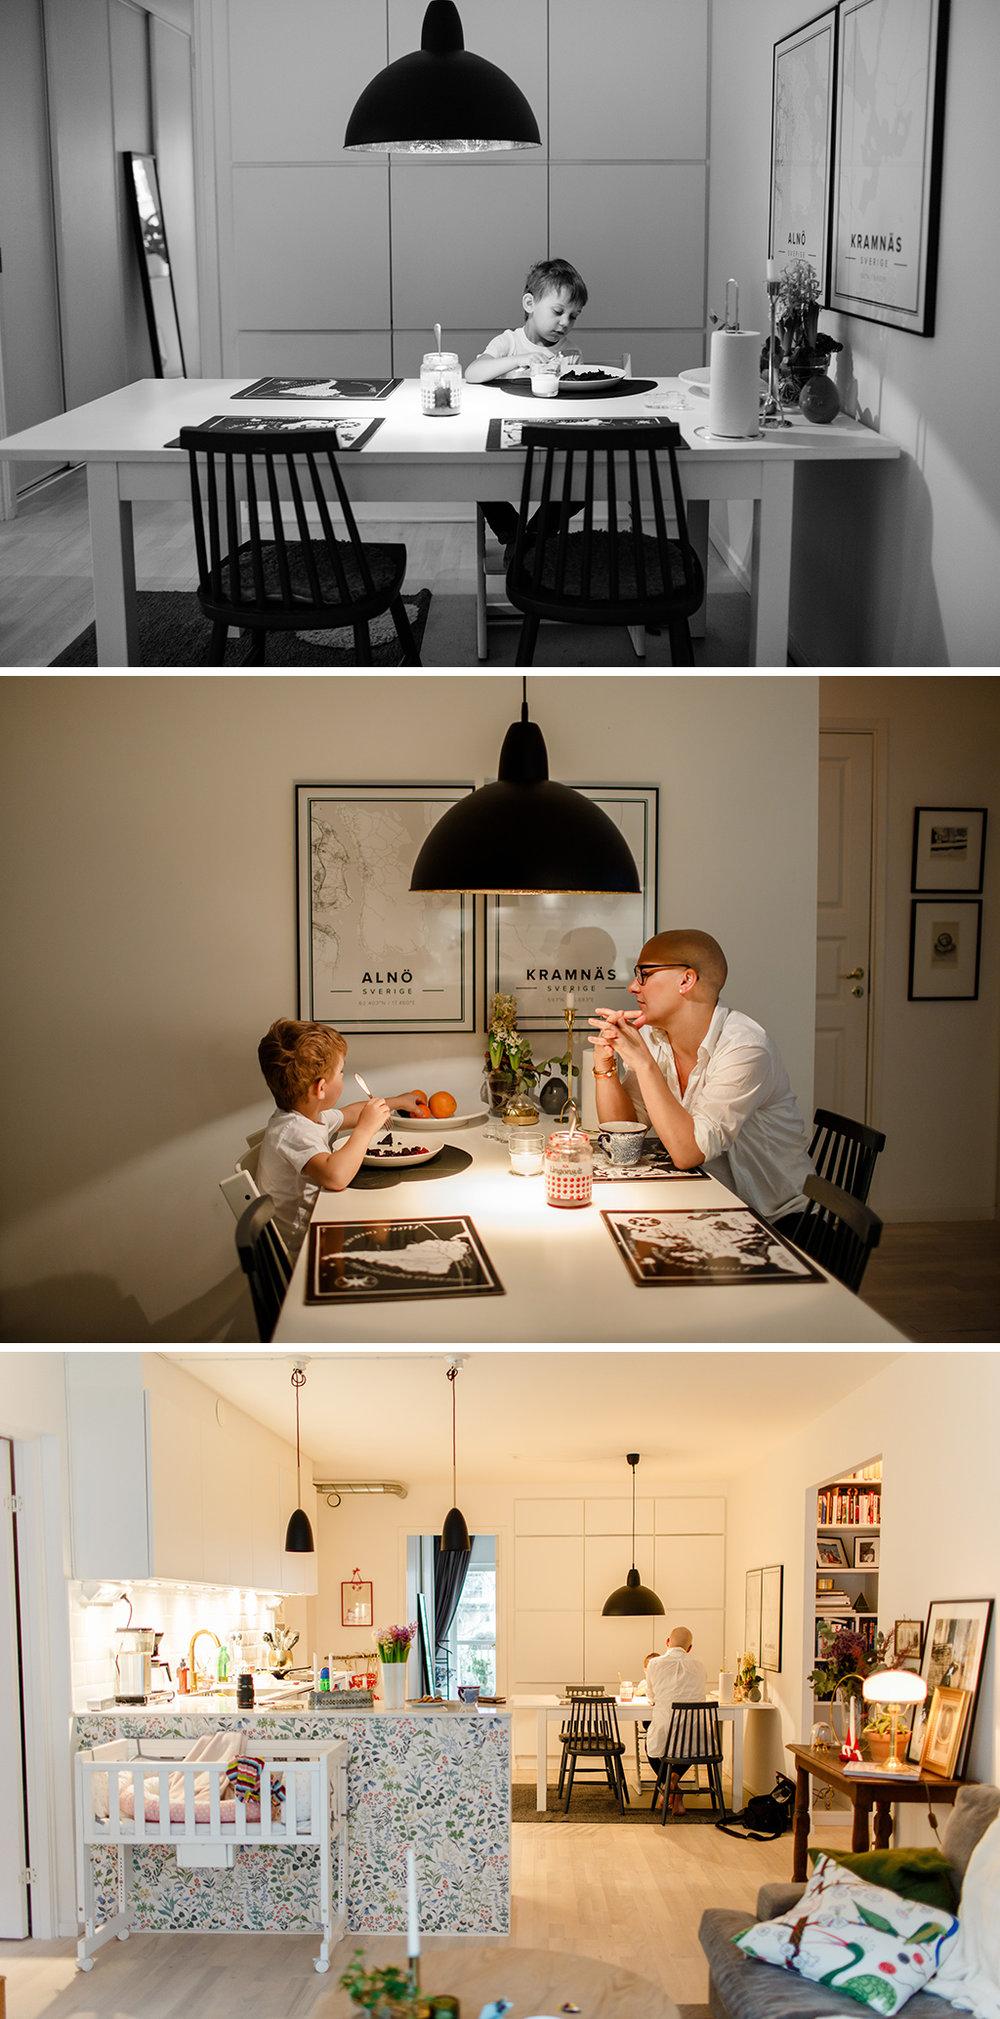 Lifestyle-nyfoddfotografering_newbornphotography_familjefotograf_Stockholm_10.jpg